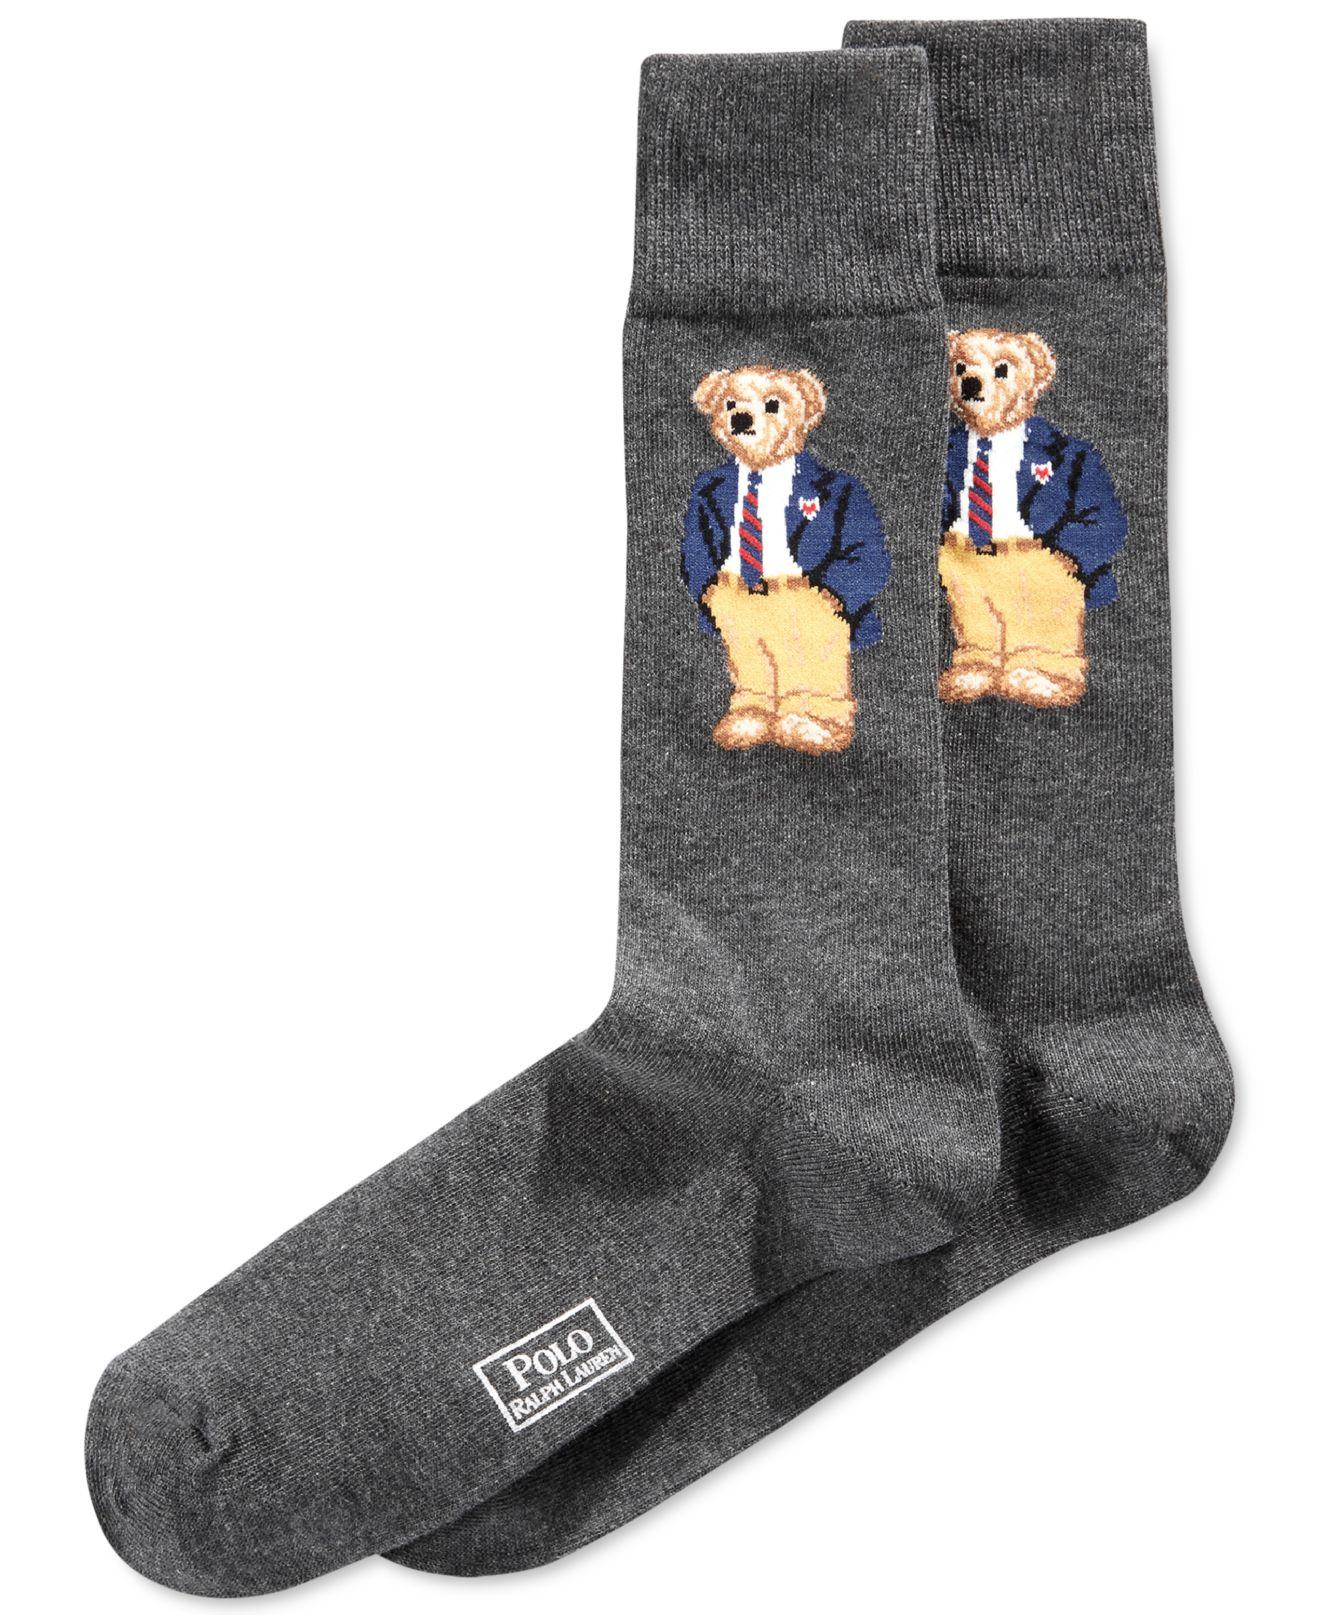 8cf3b1a485655 Lyst - Polo Ralph Lauren Office Bear Socks in Gray for Men